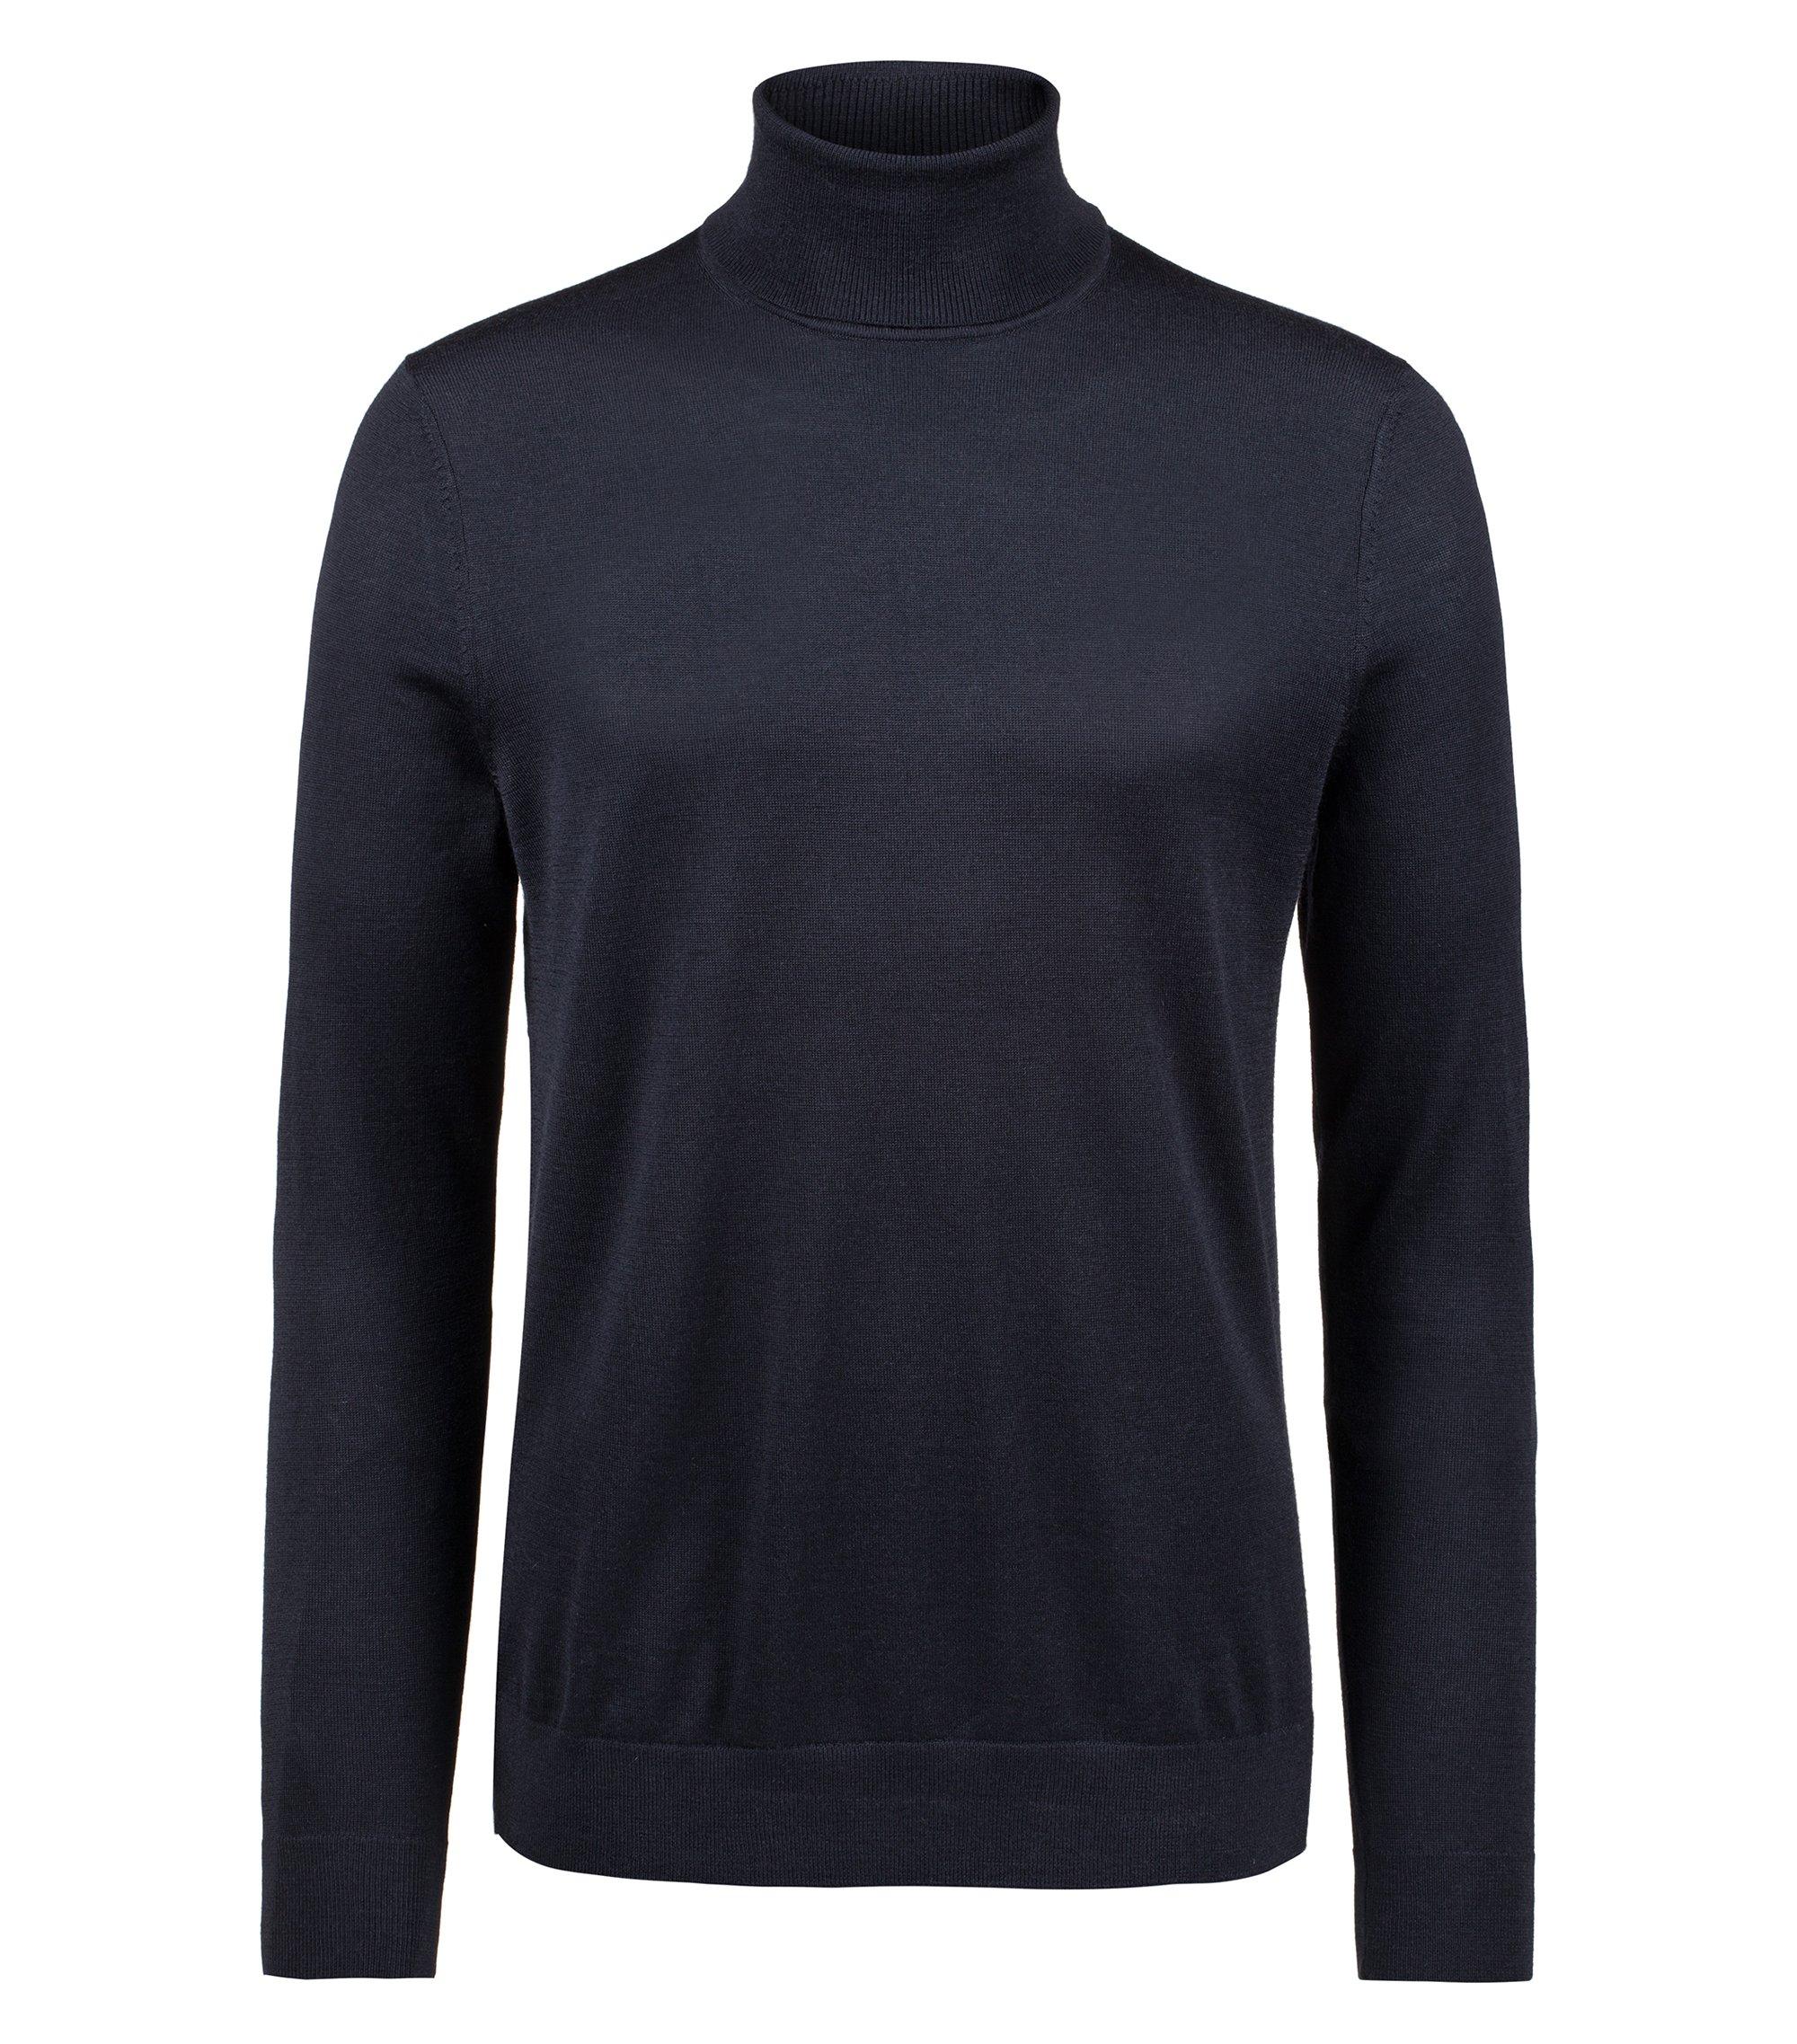 Jersey de cuello alto en mezcla de lana de merino, Azul oscuro